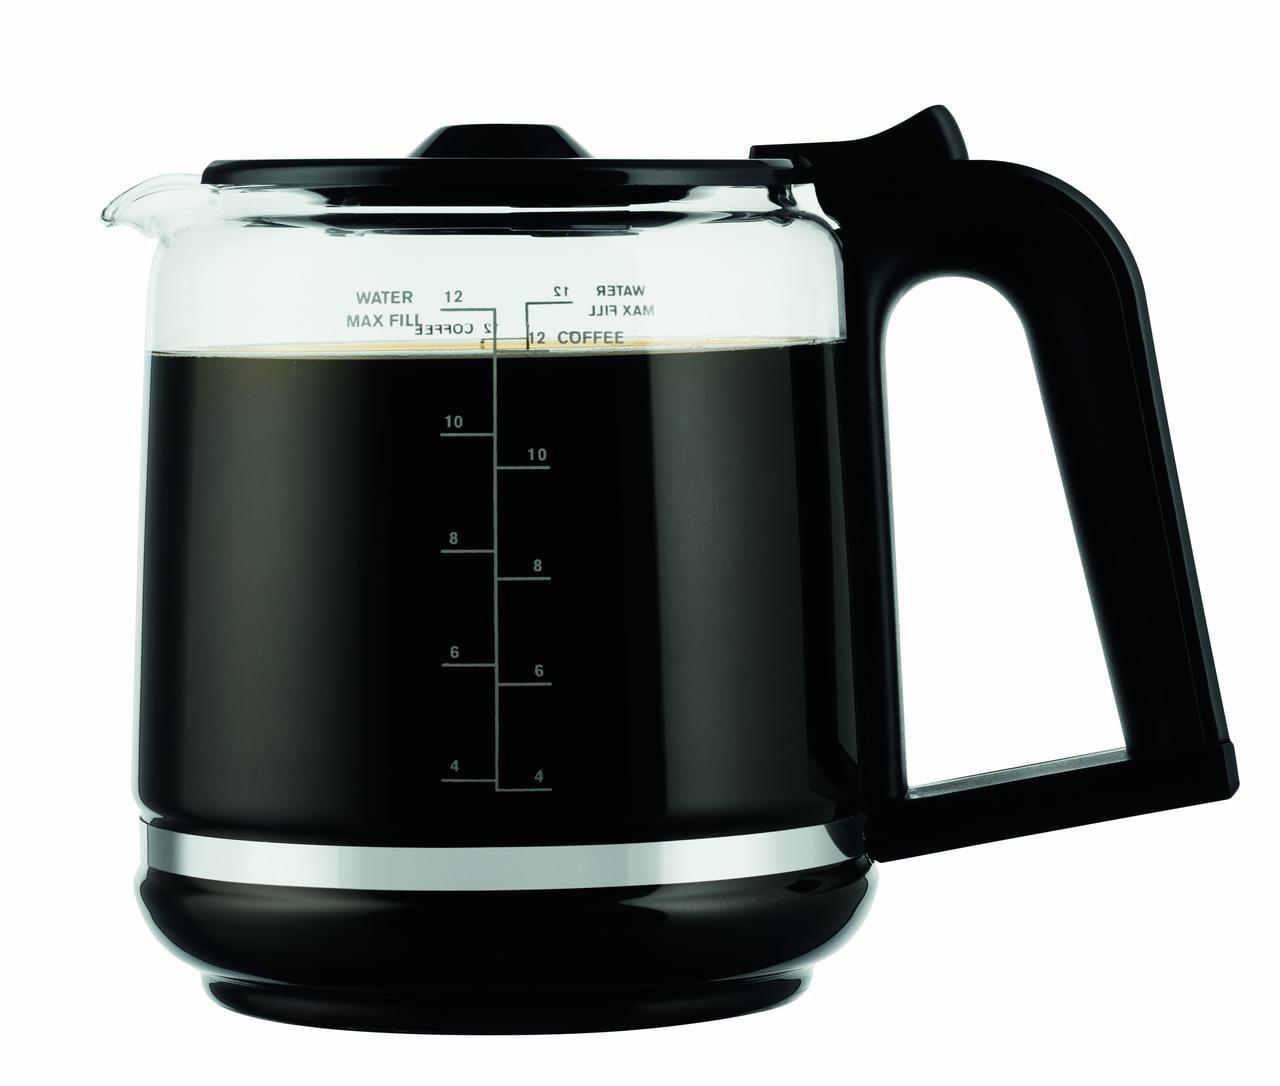 Black KRUPS EC3110 12-Cup Glass Carafe Programmable Coffee Maker